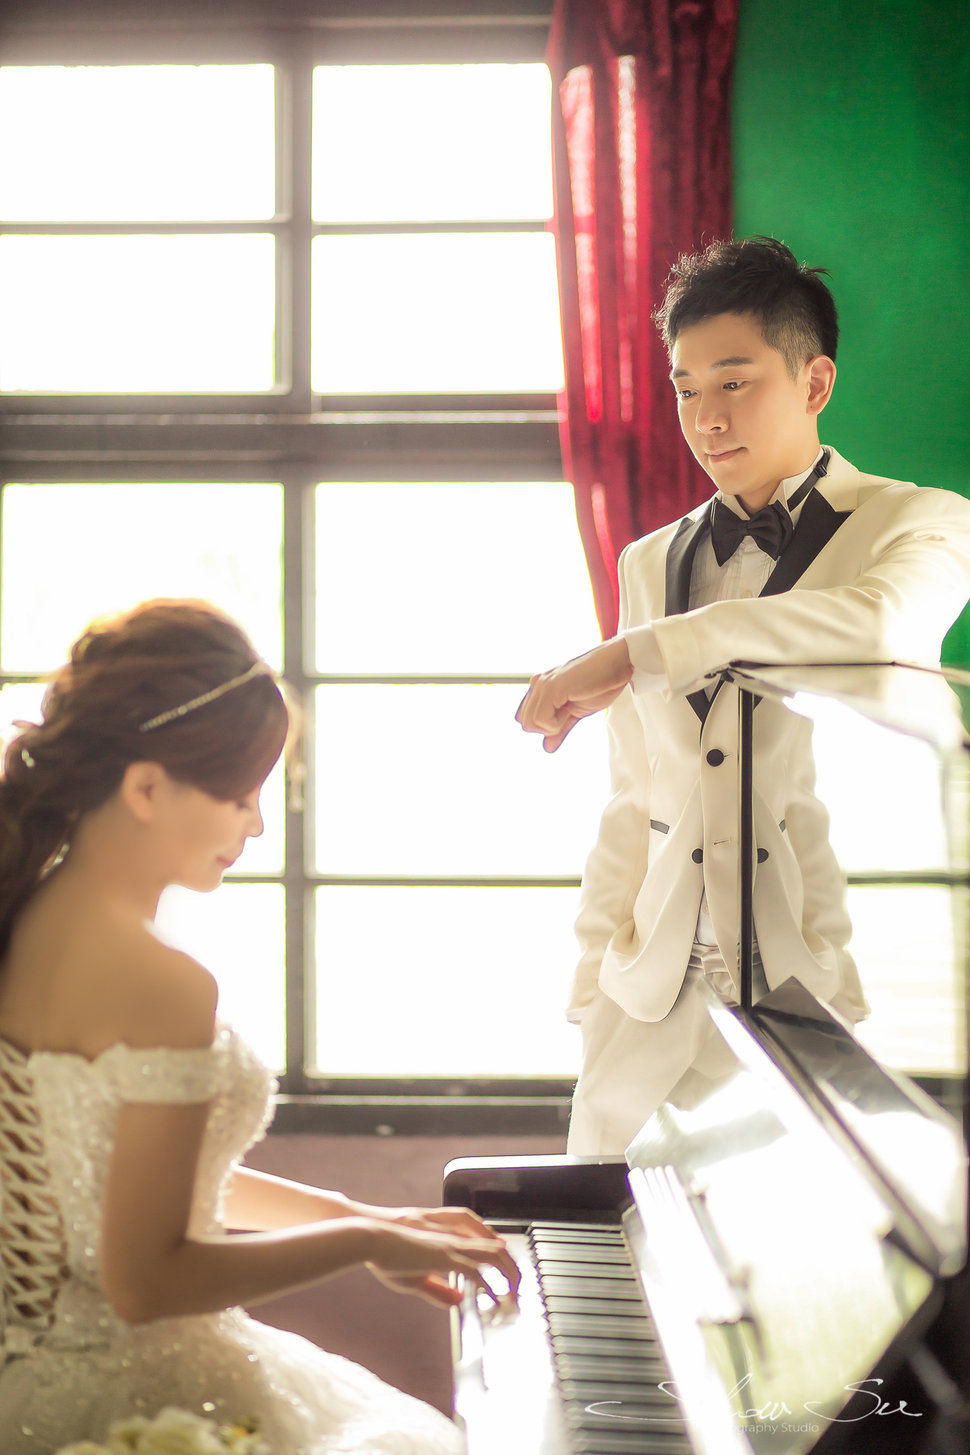 IMG_4774 - Show Su Photography《結婚吧》